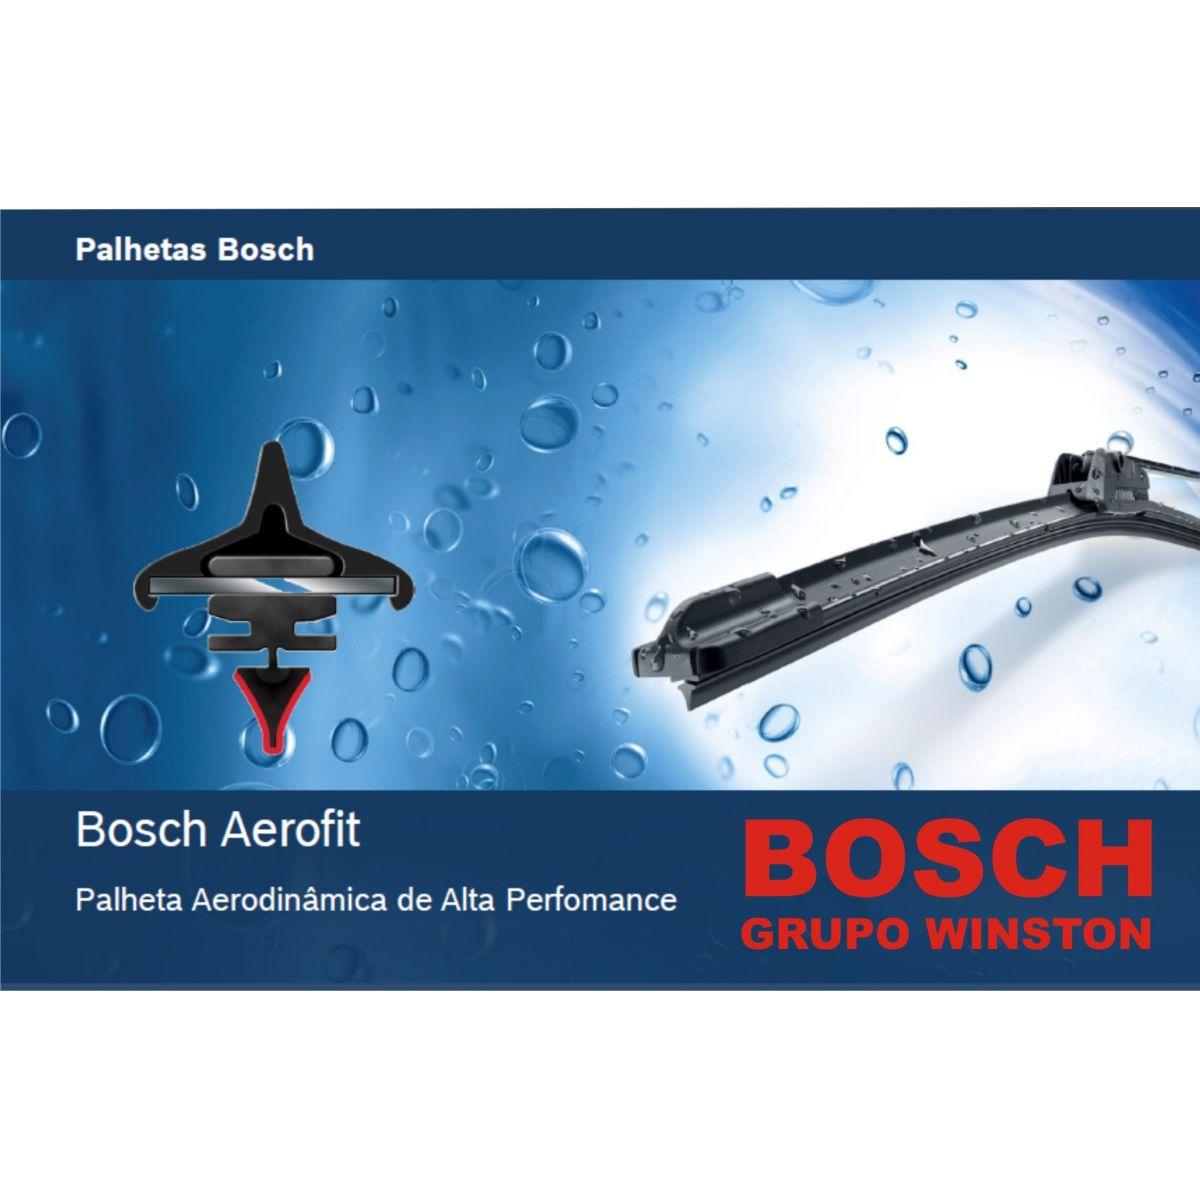 Palheta Bosch Aerofit Limpador de para brisa Bosch JAGUAR F-TYPE XJ8 XK XK8